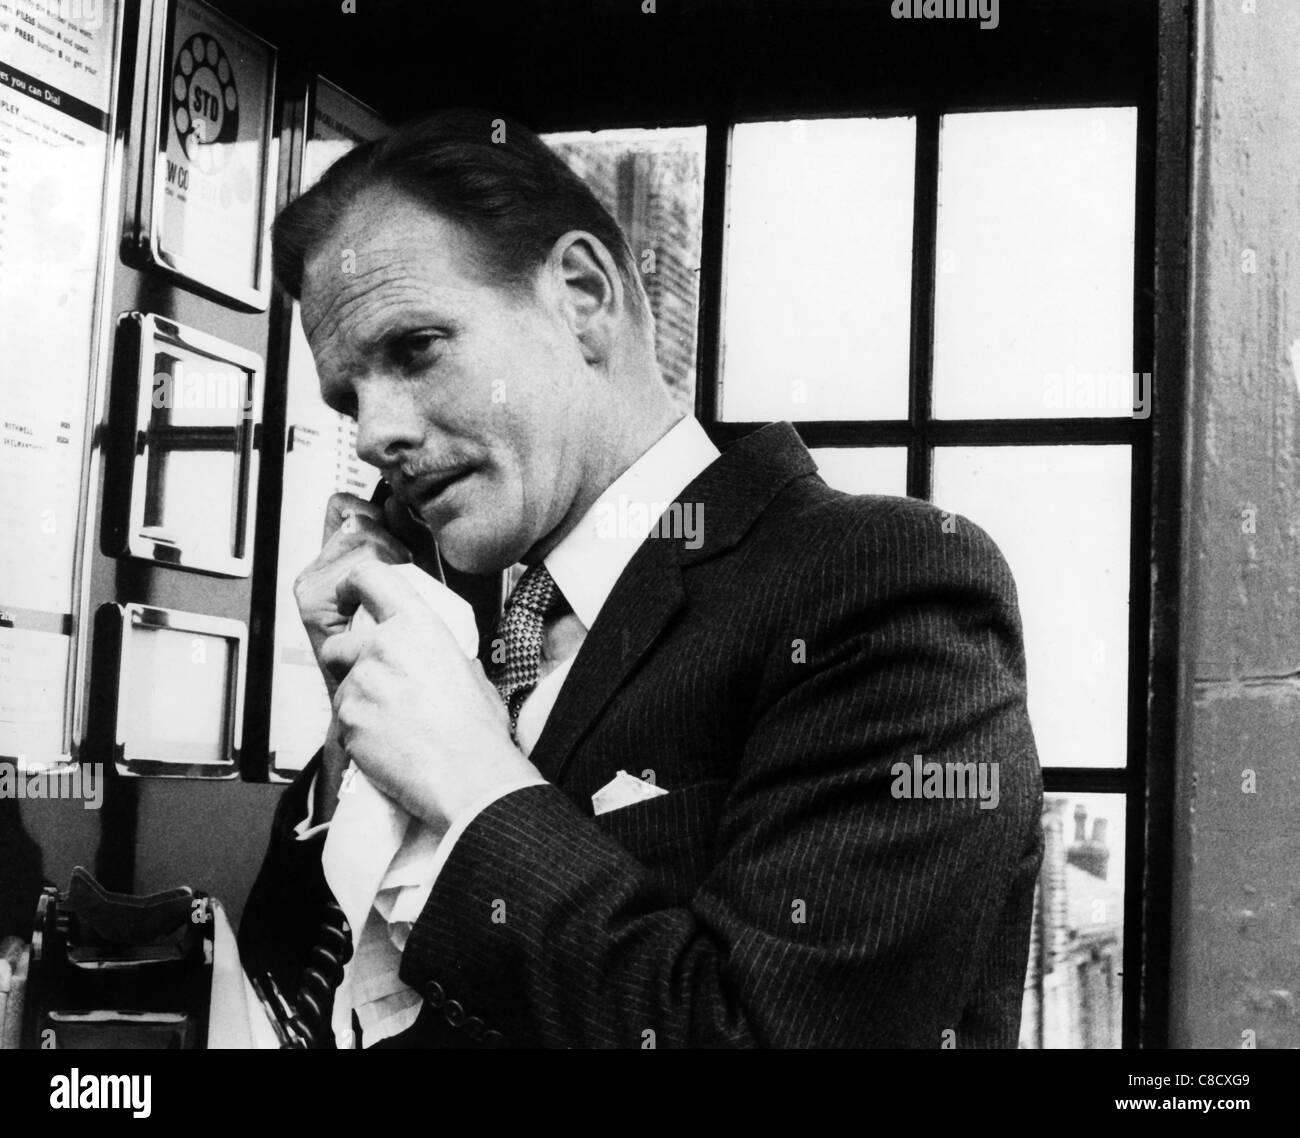 ALAN CUTHBERTSON ACTOR (1964) - Stock Image